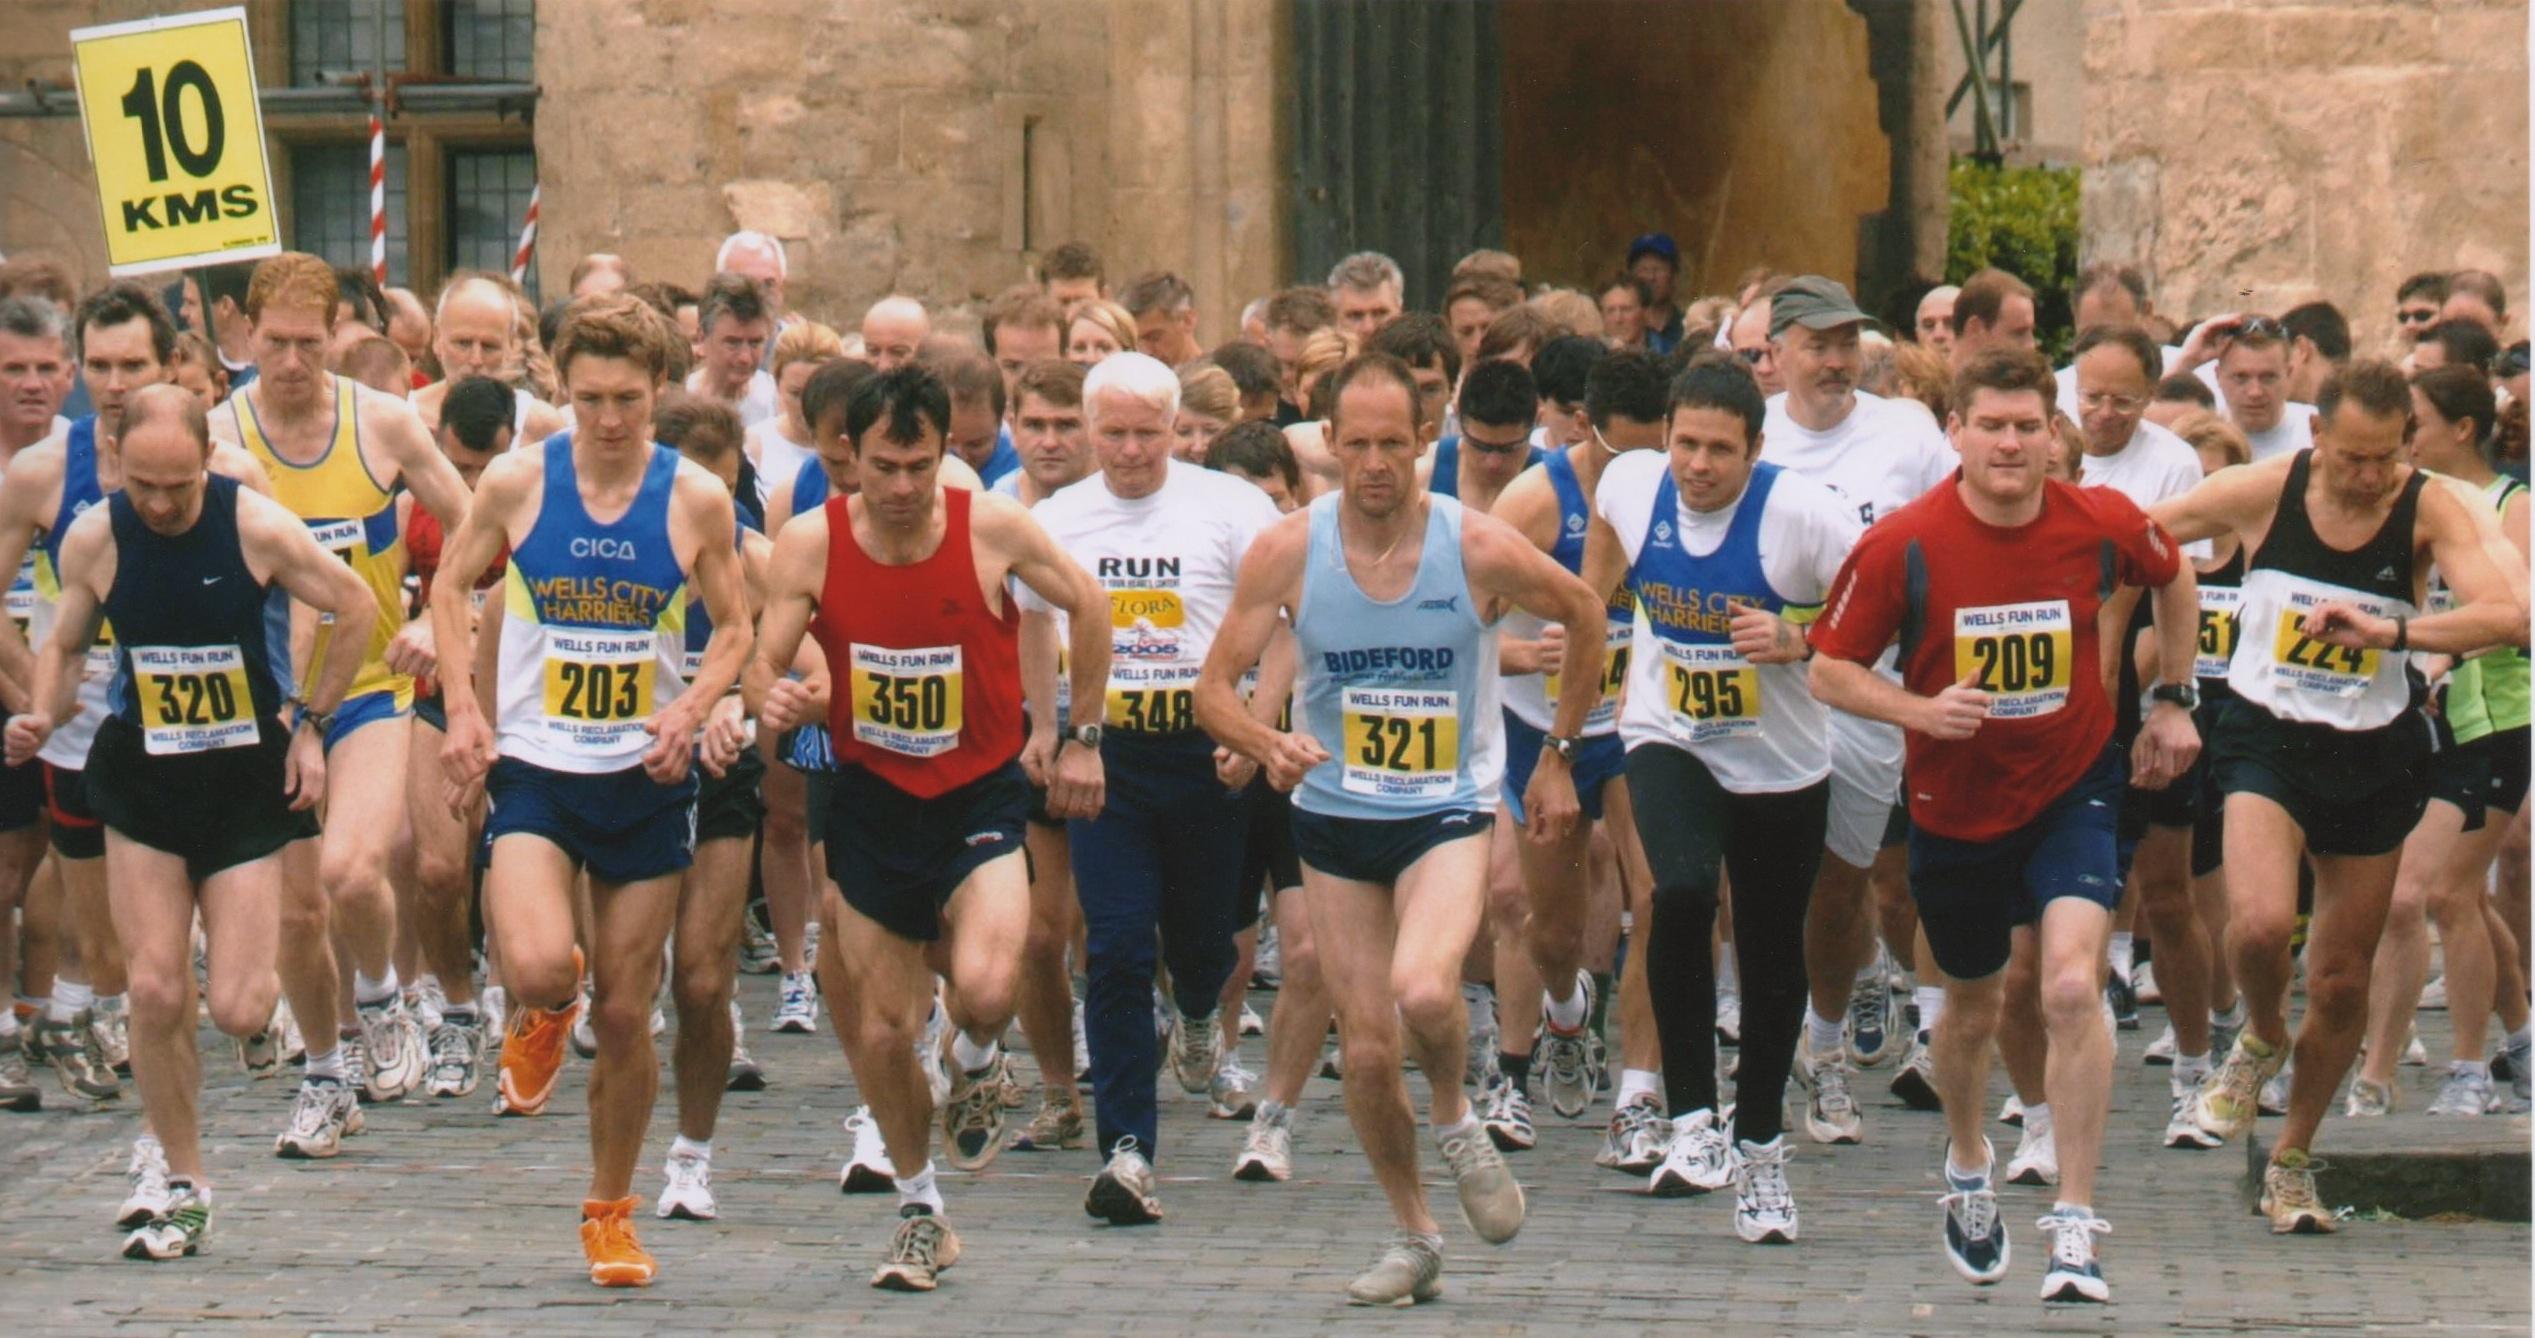 Wells Fun Run start